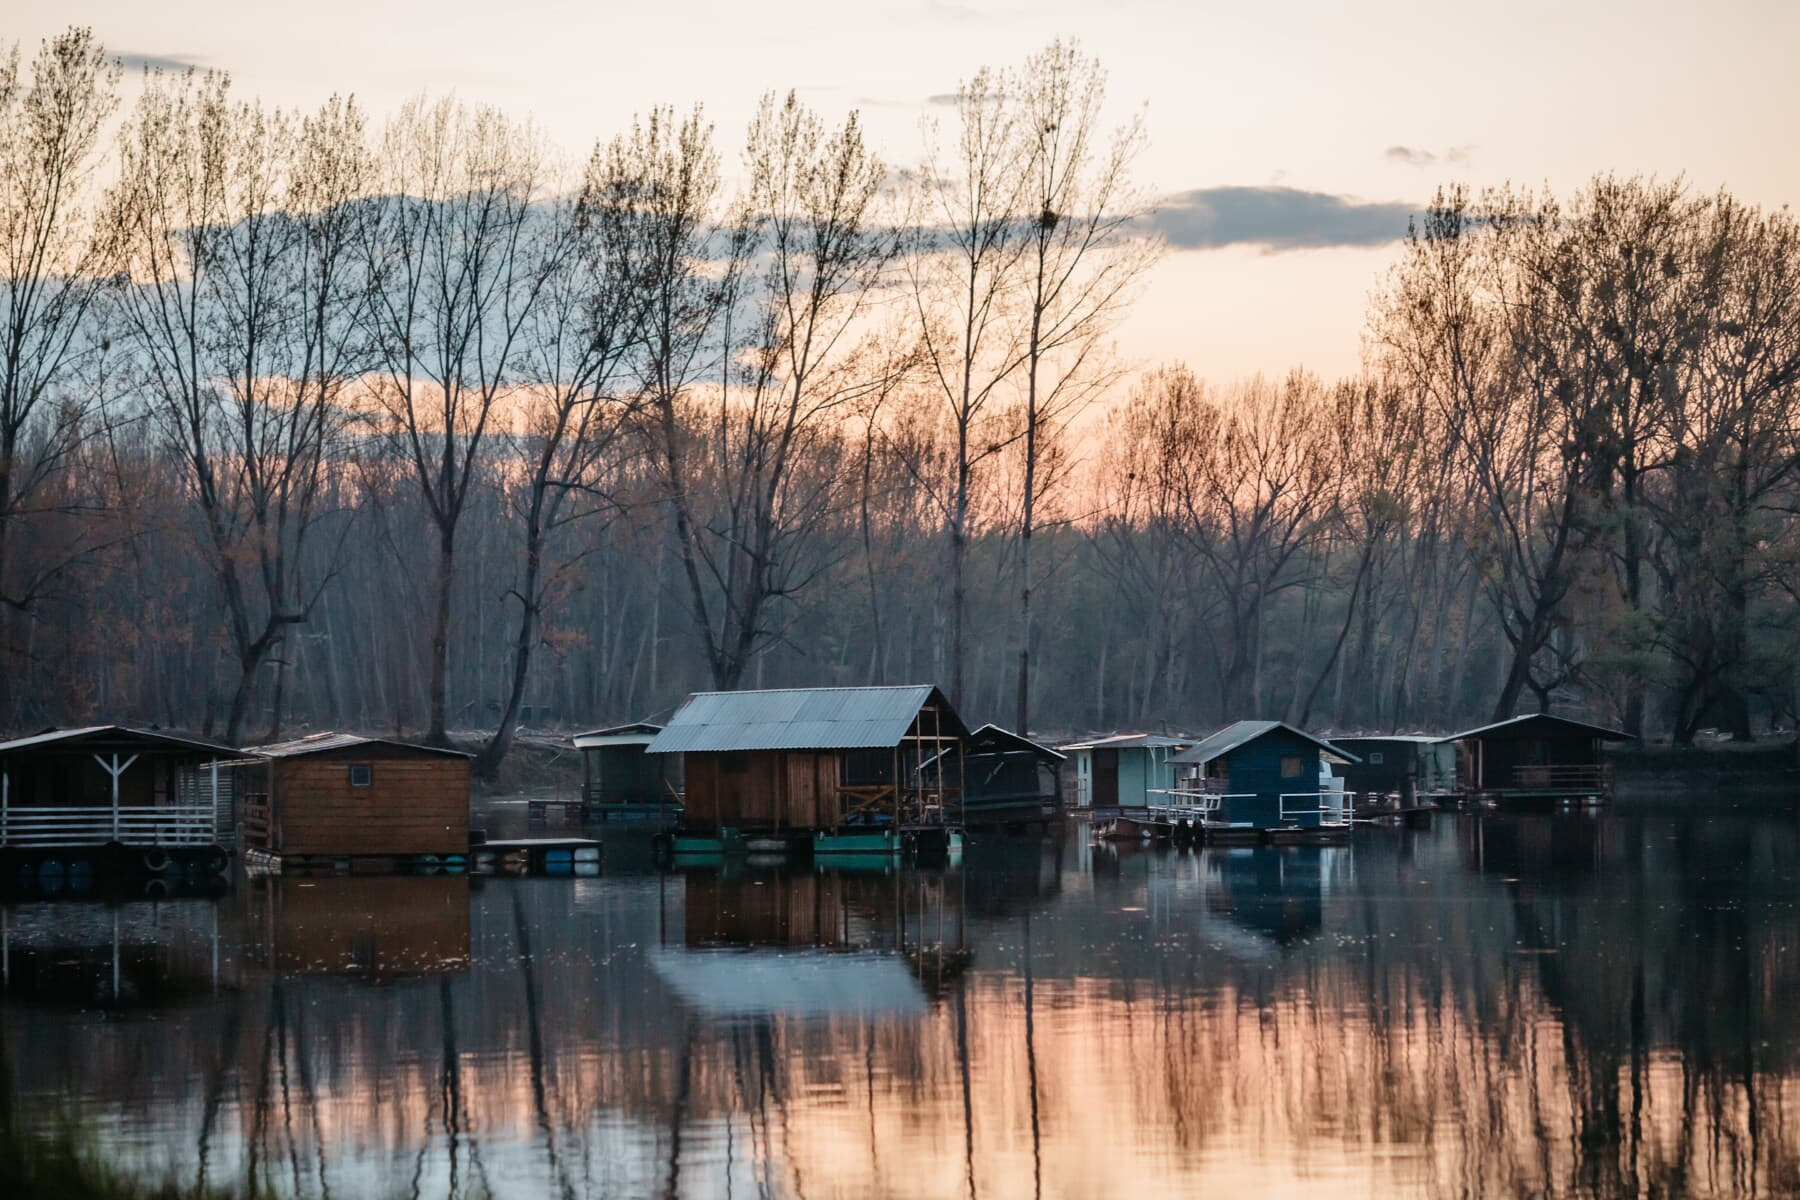 lake, boathouse, lakeside, water, shed, reflection, building, landscape, house, nature